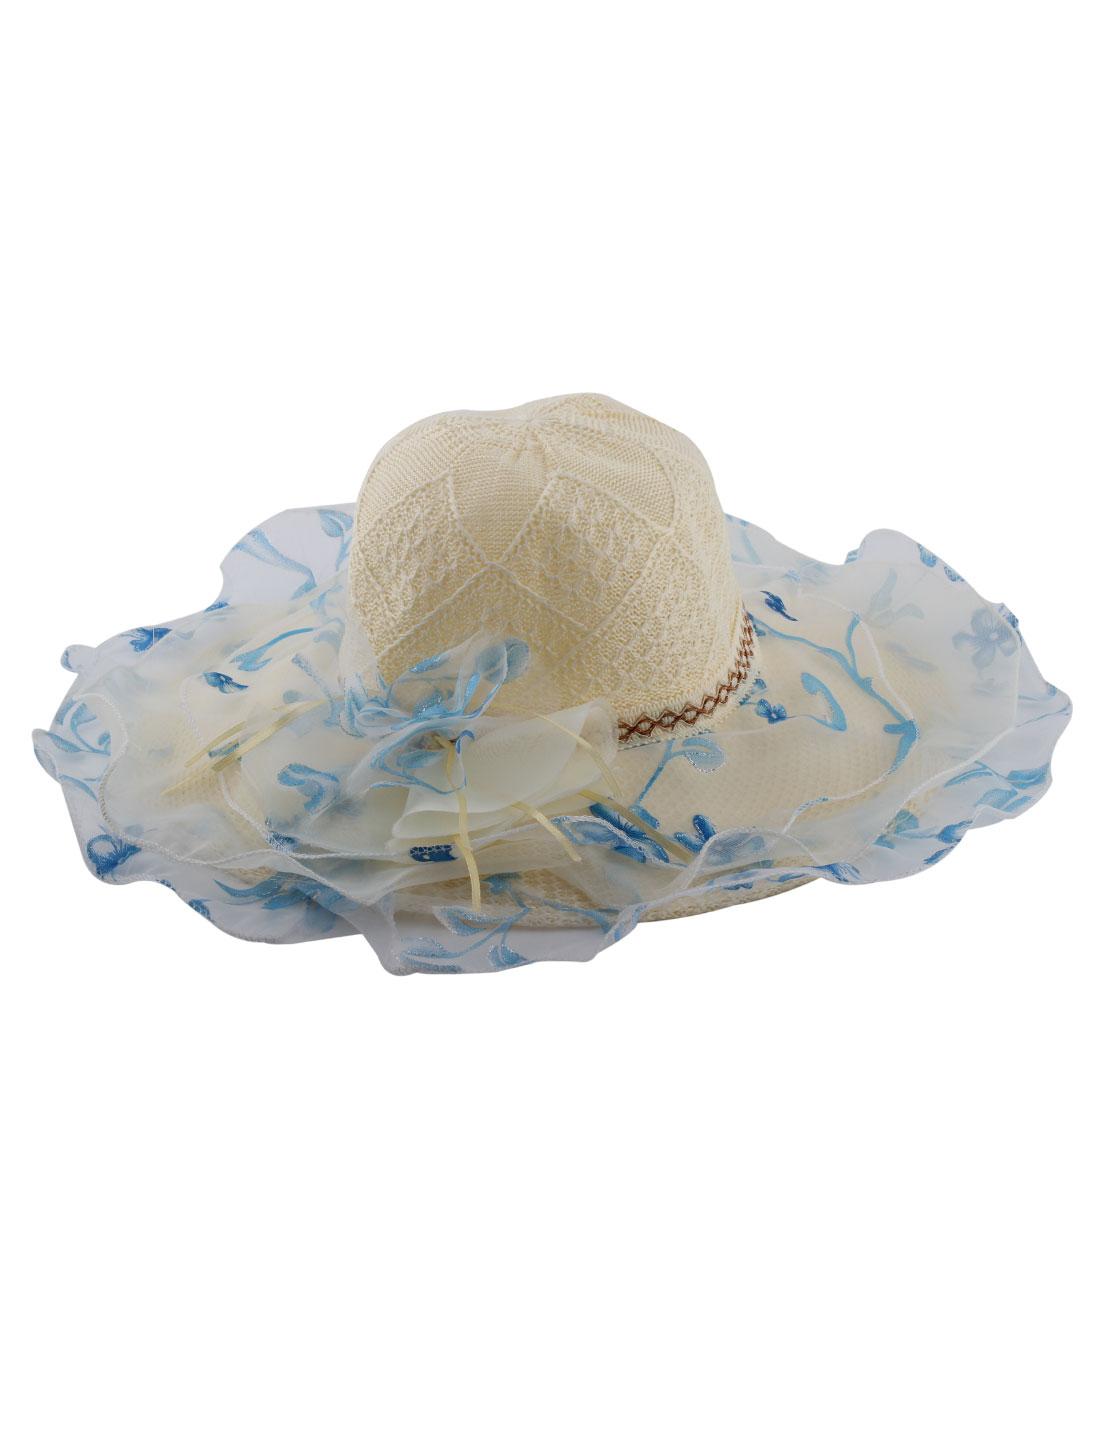 Lady Polyester Woven Organza Flower Decor Wide Brim Beach Sun Hat Cap Beige Blue